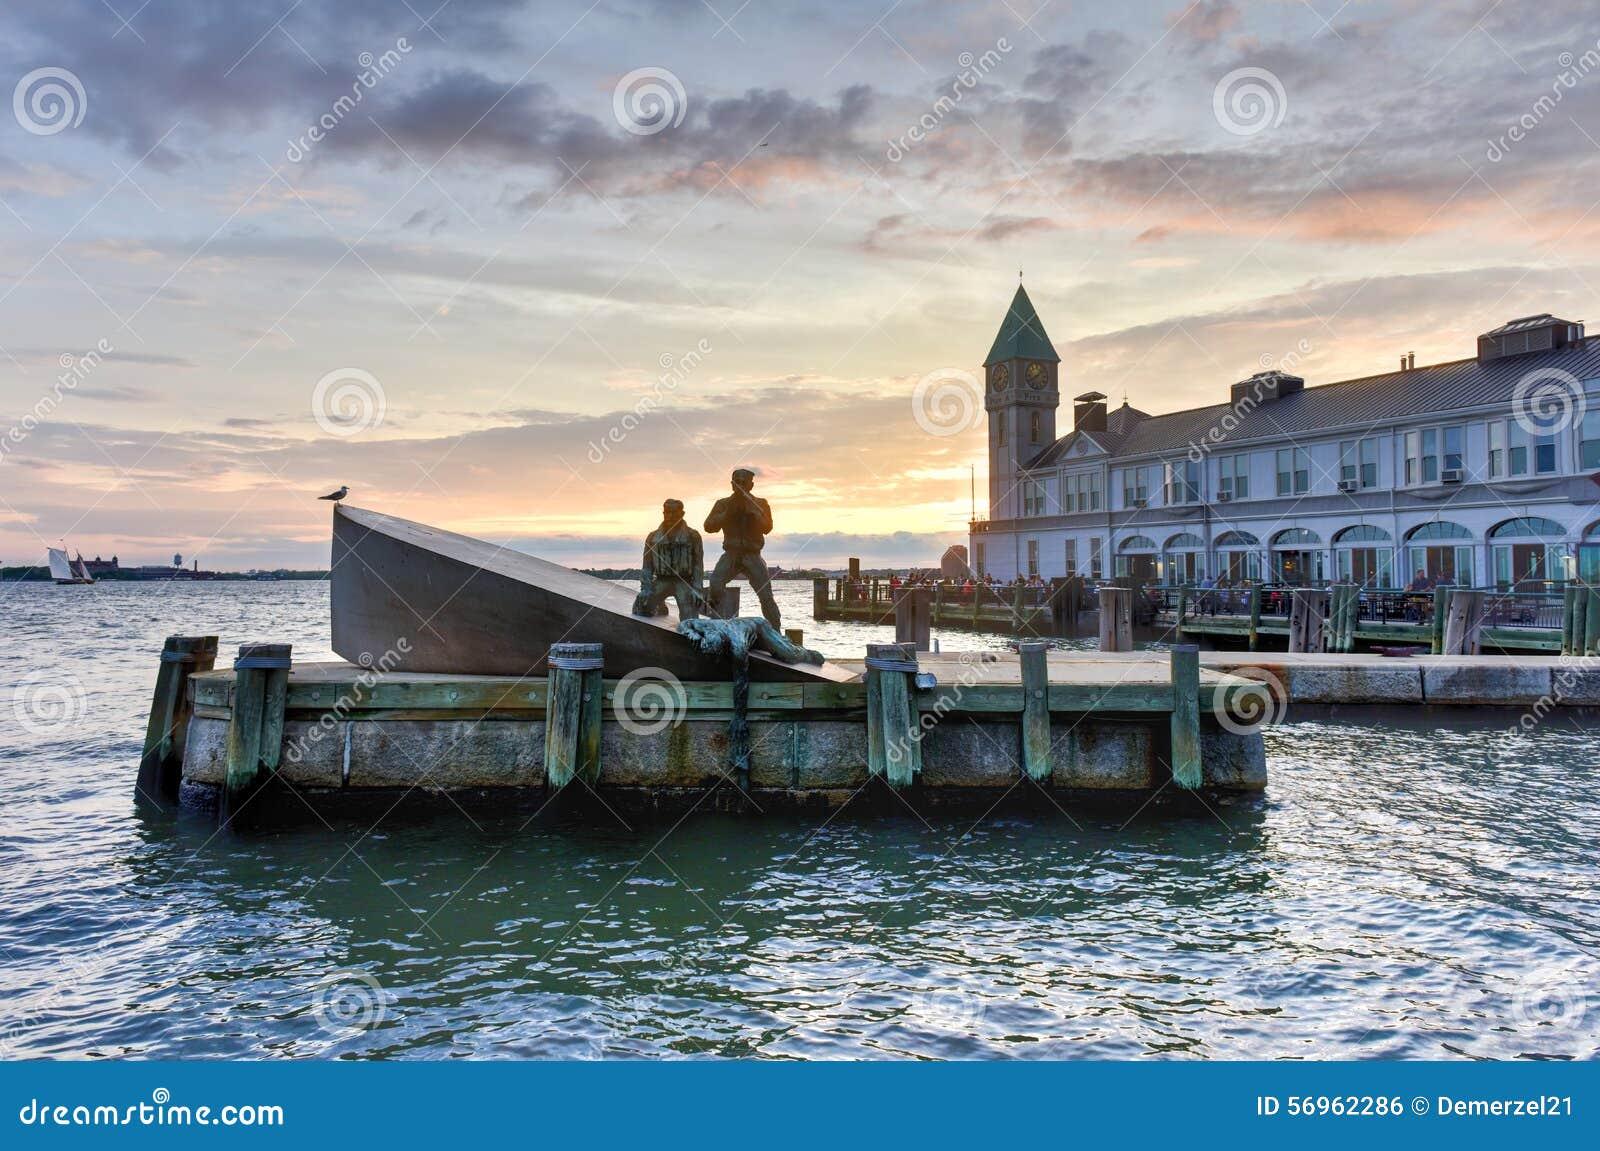 Fanti di marina mercantili americani commemorativi